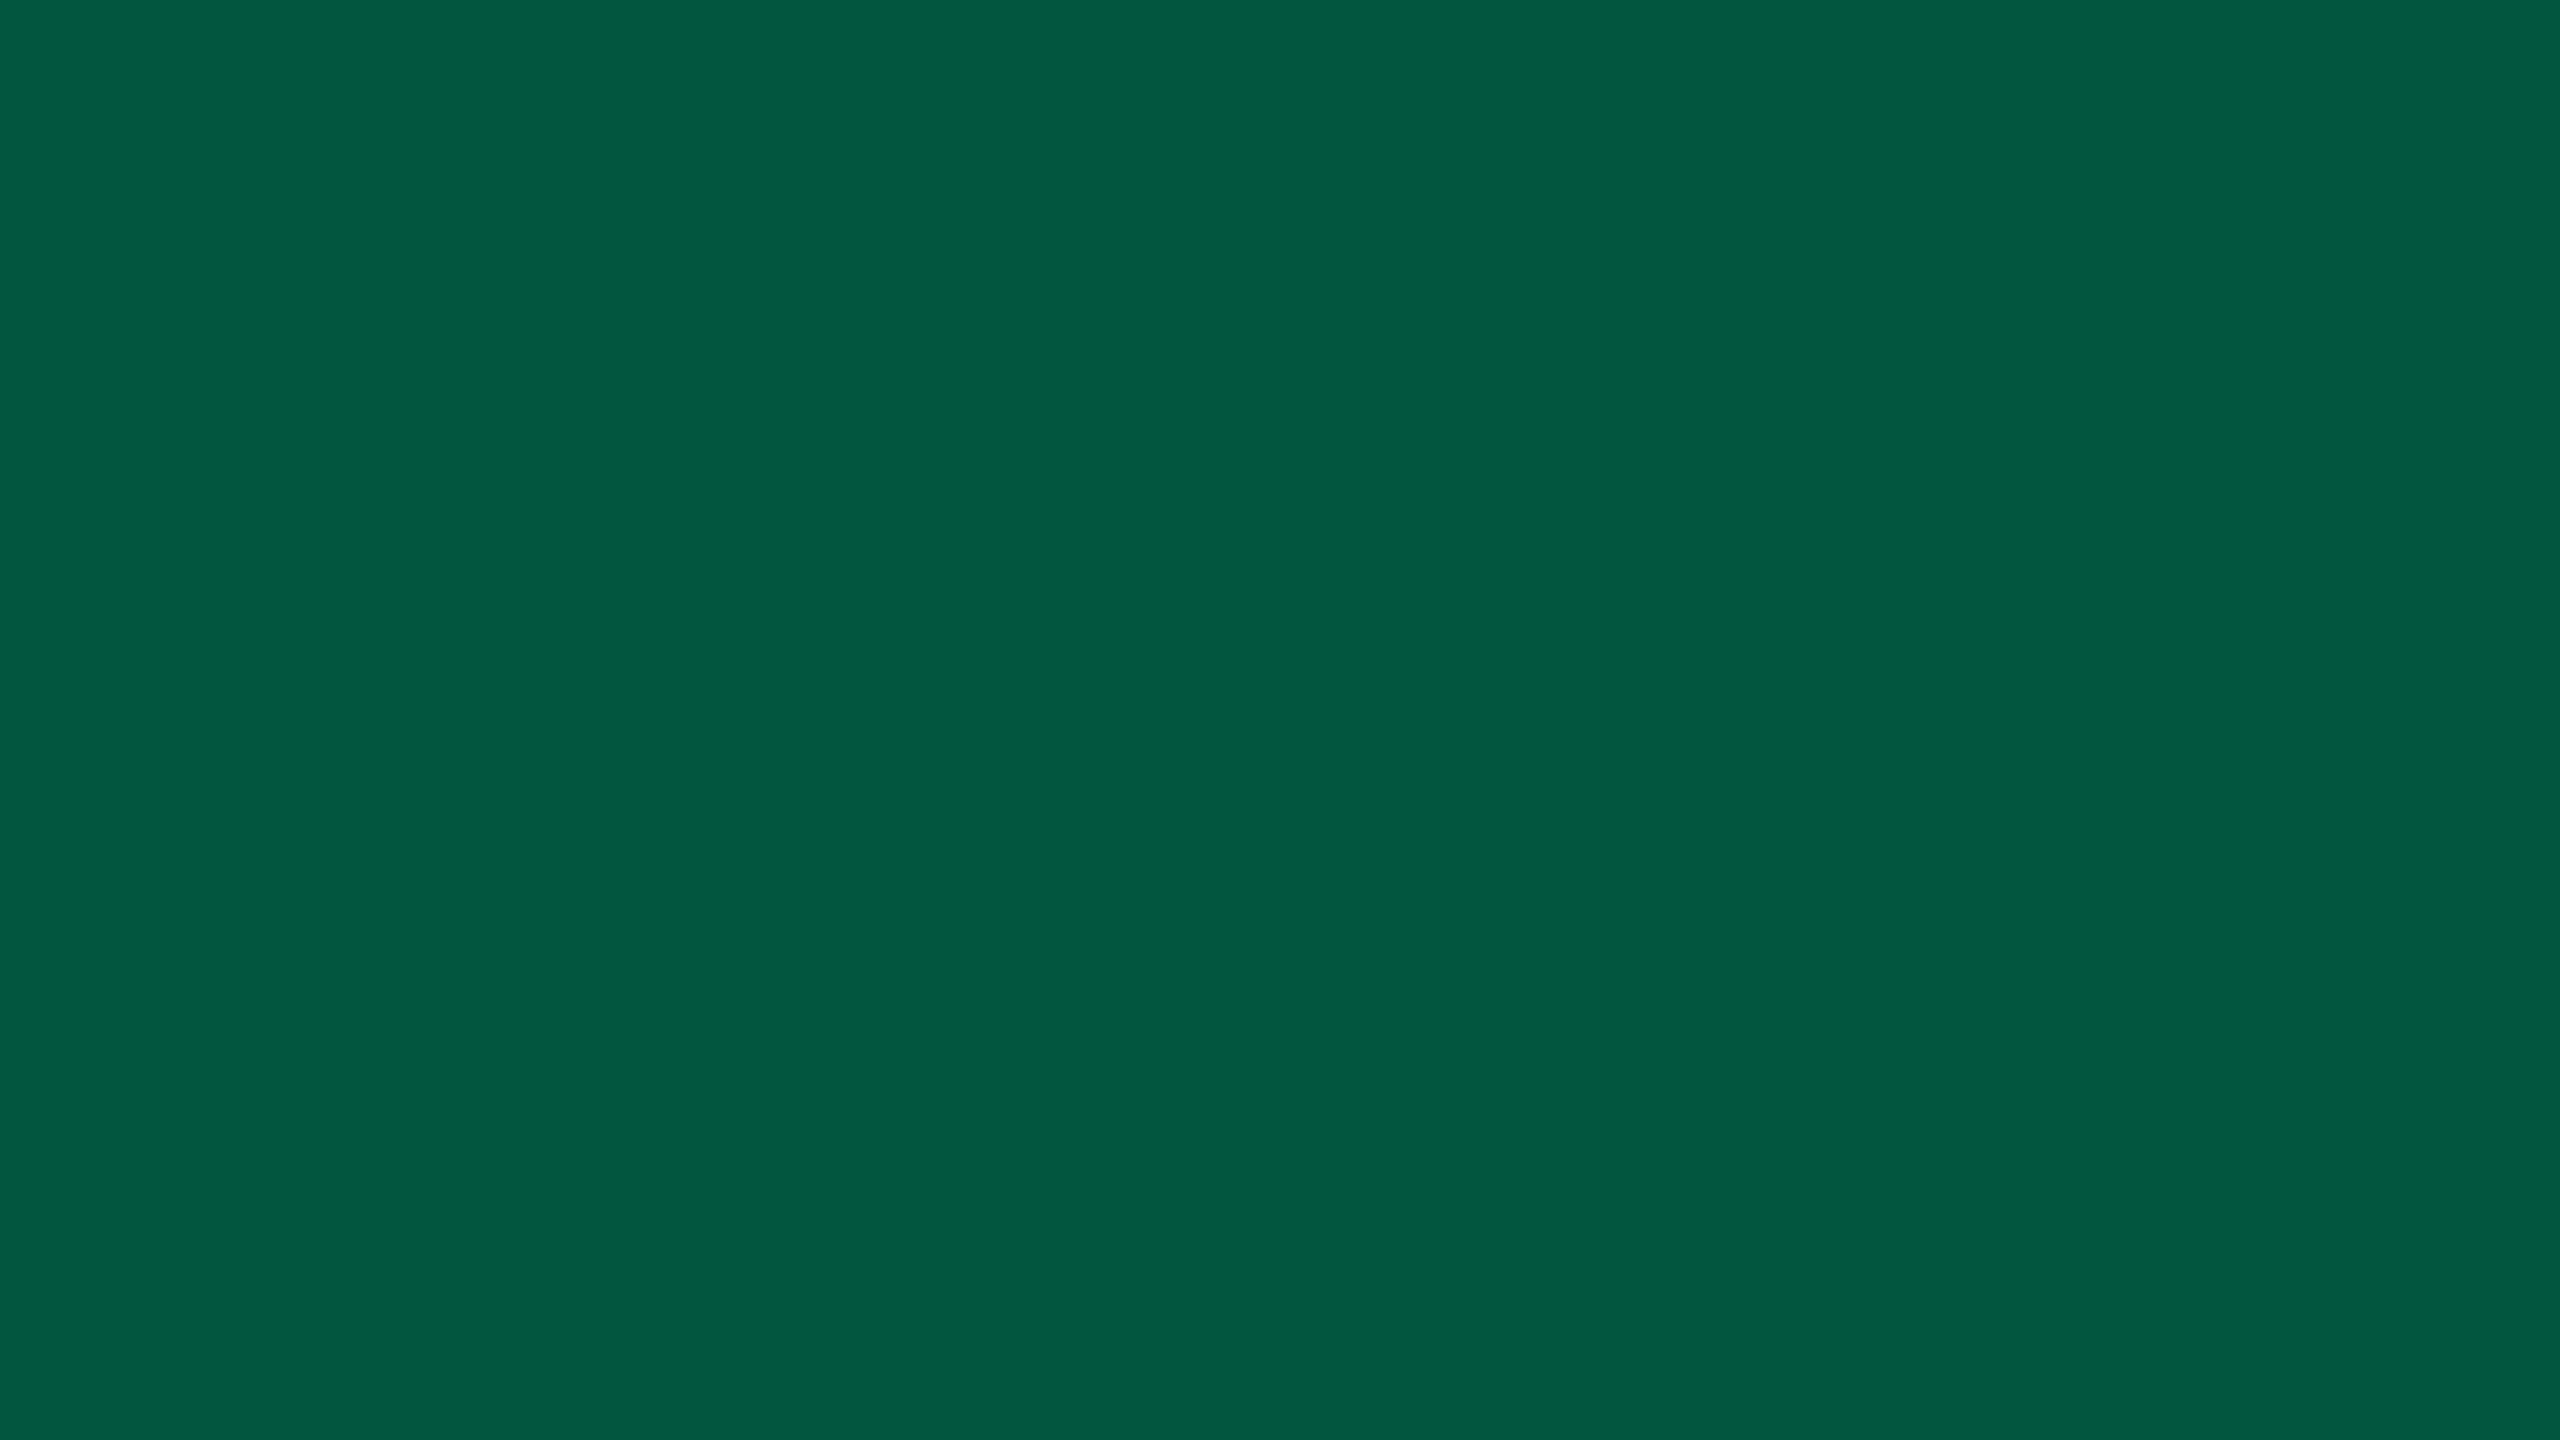 2560x1440 Castleton Green Solid Color Background